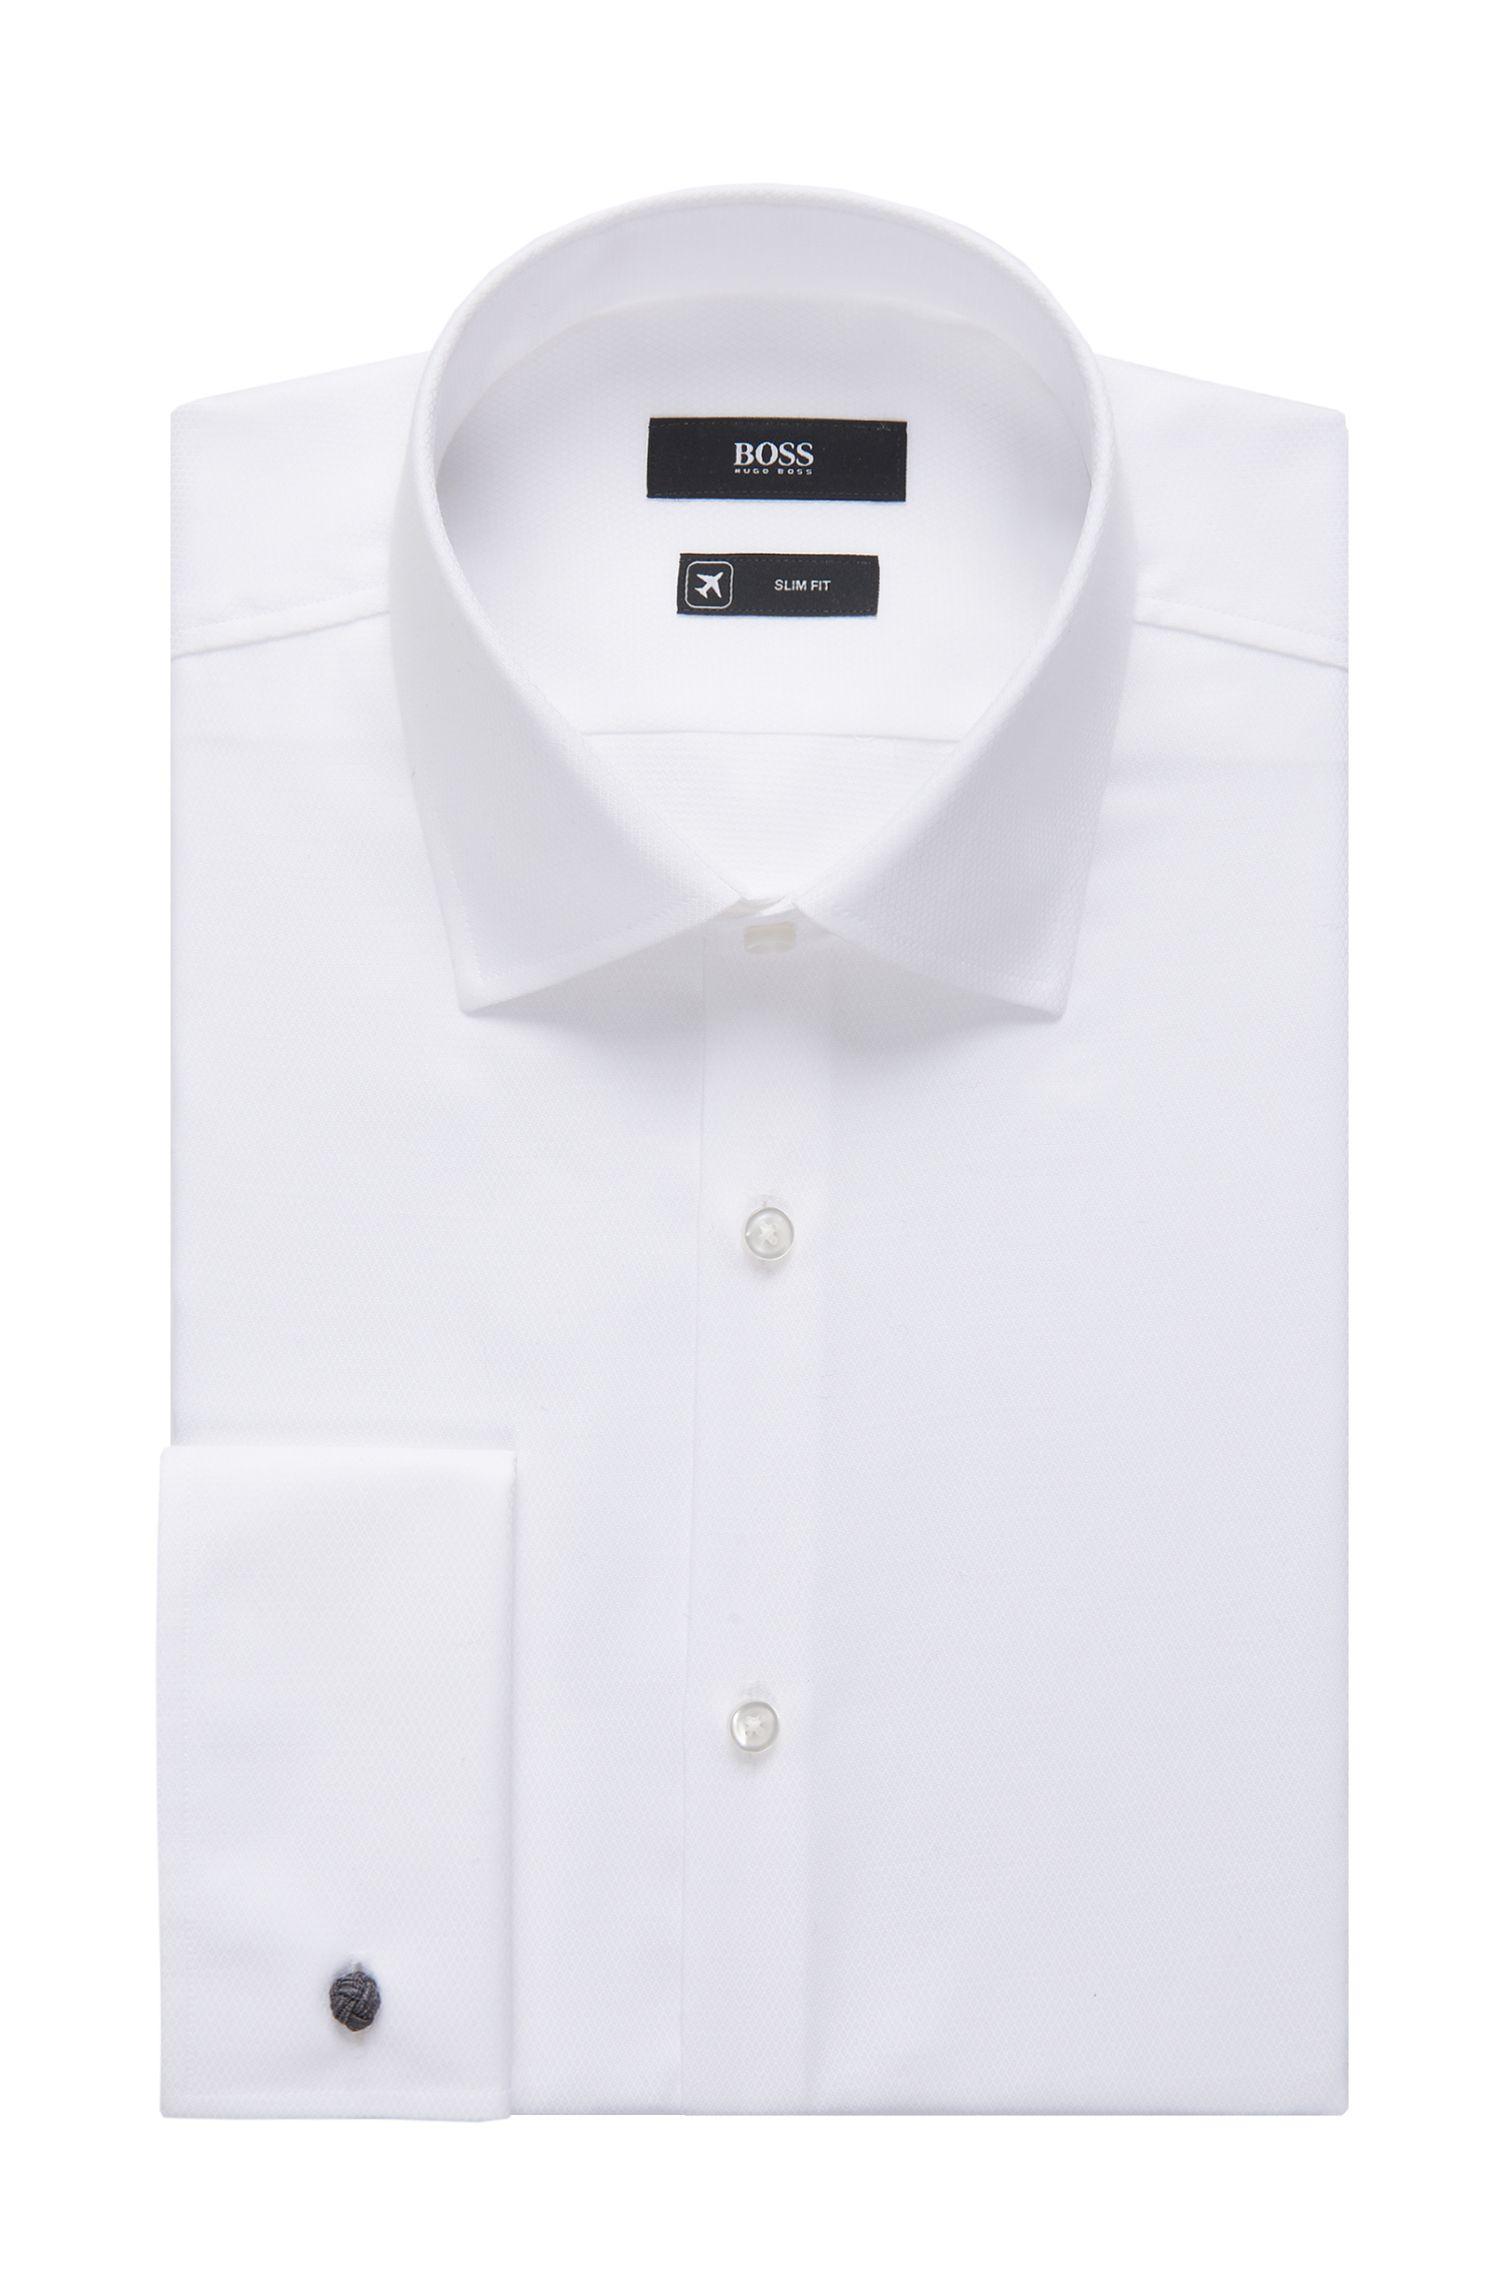 'Jacques' | Slim Fit, Italian Cotton French Cuff Dress Shirt